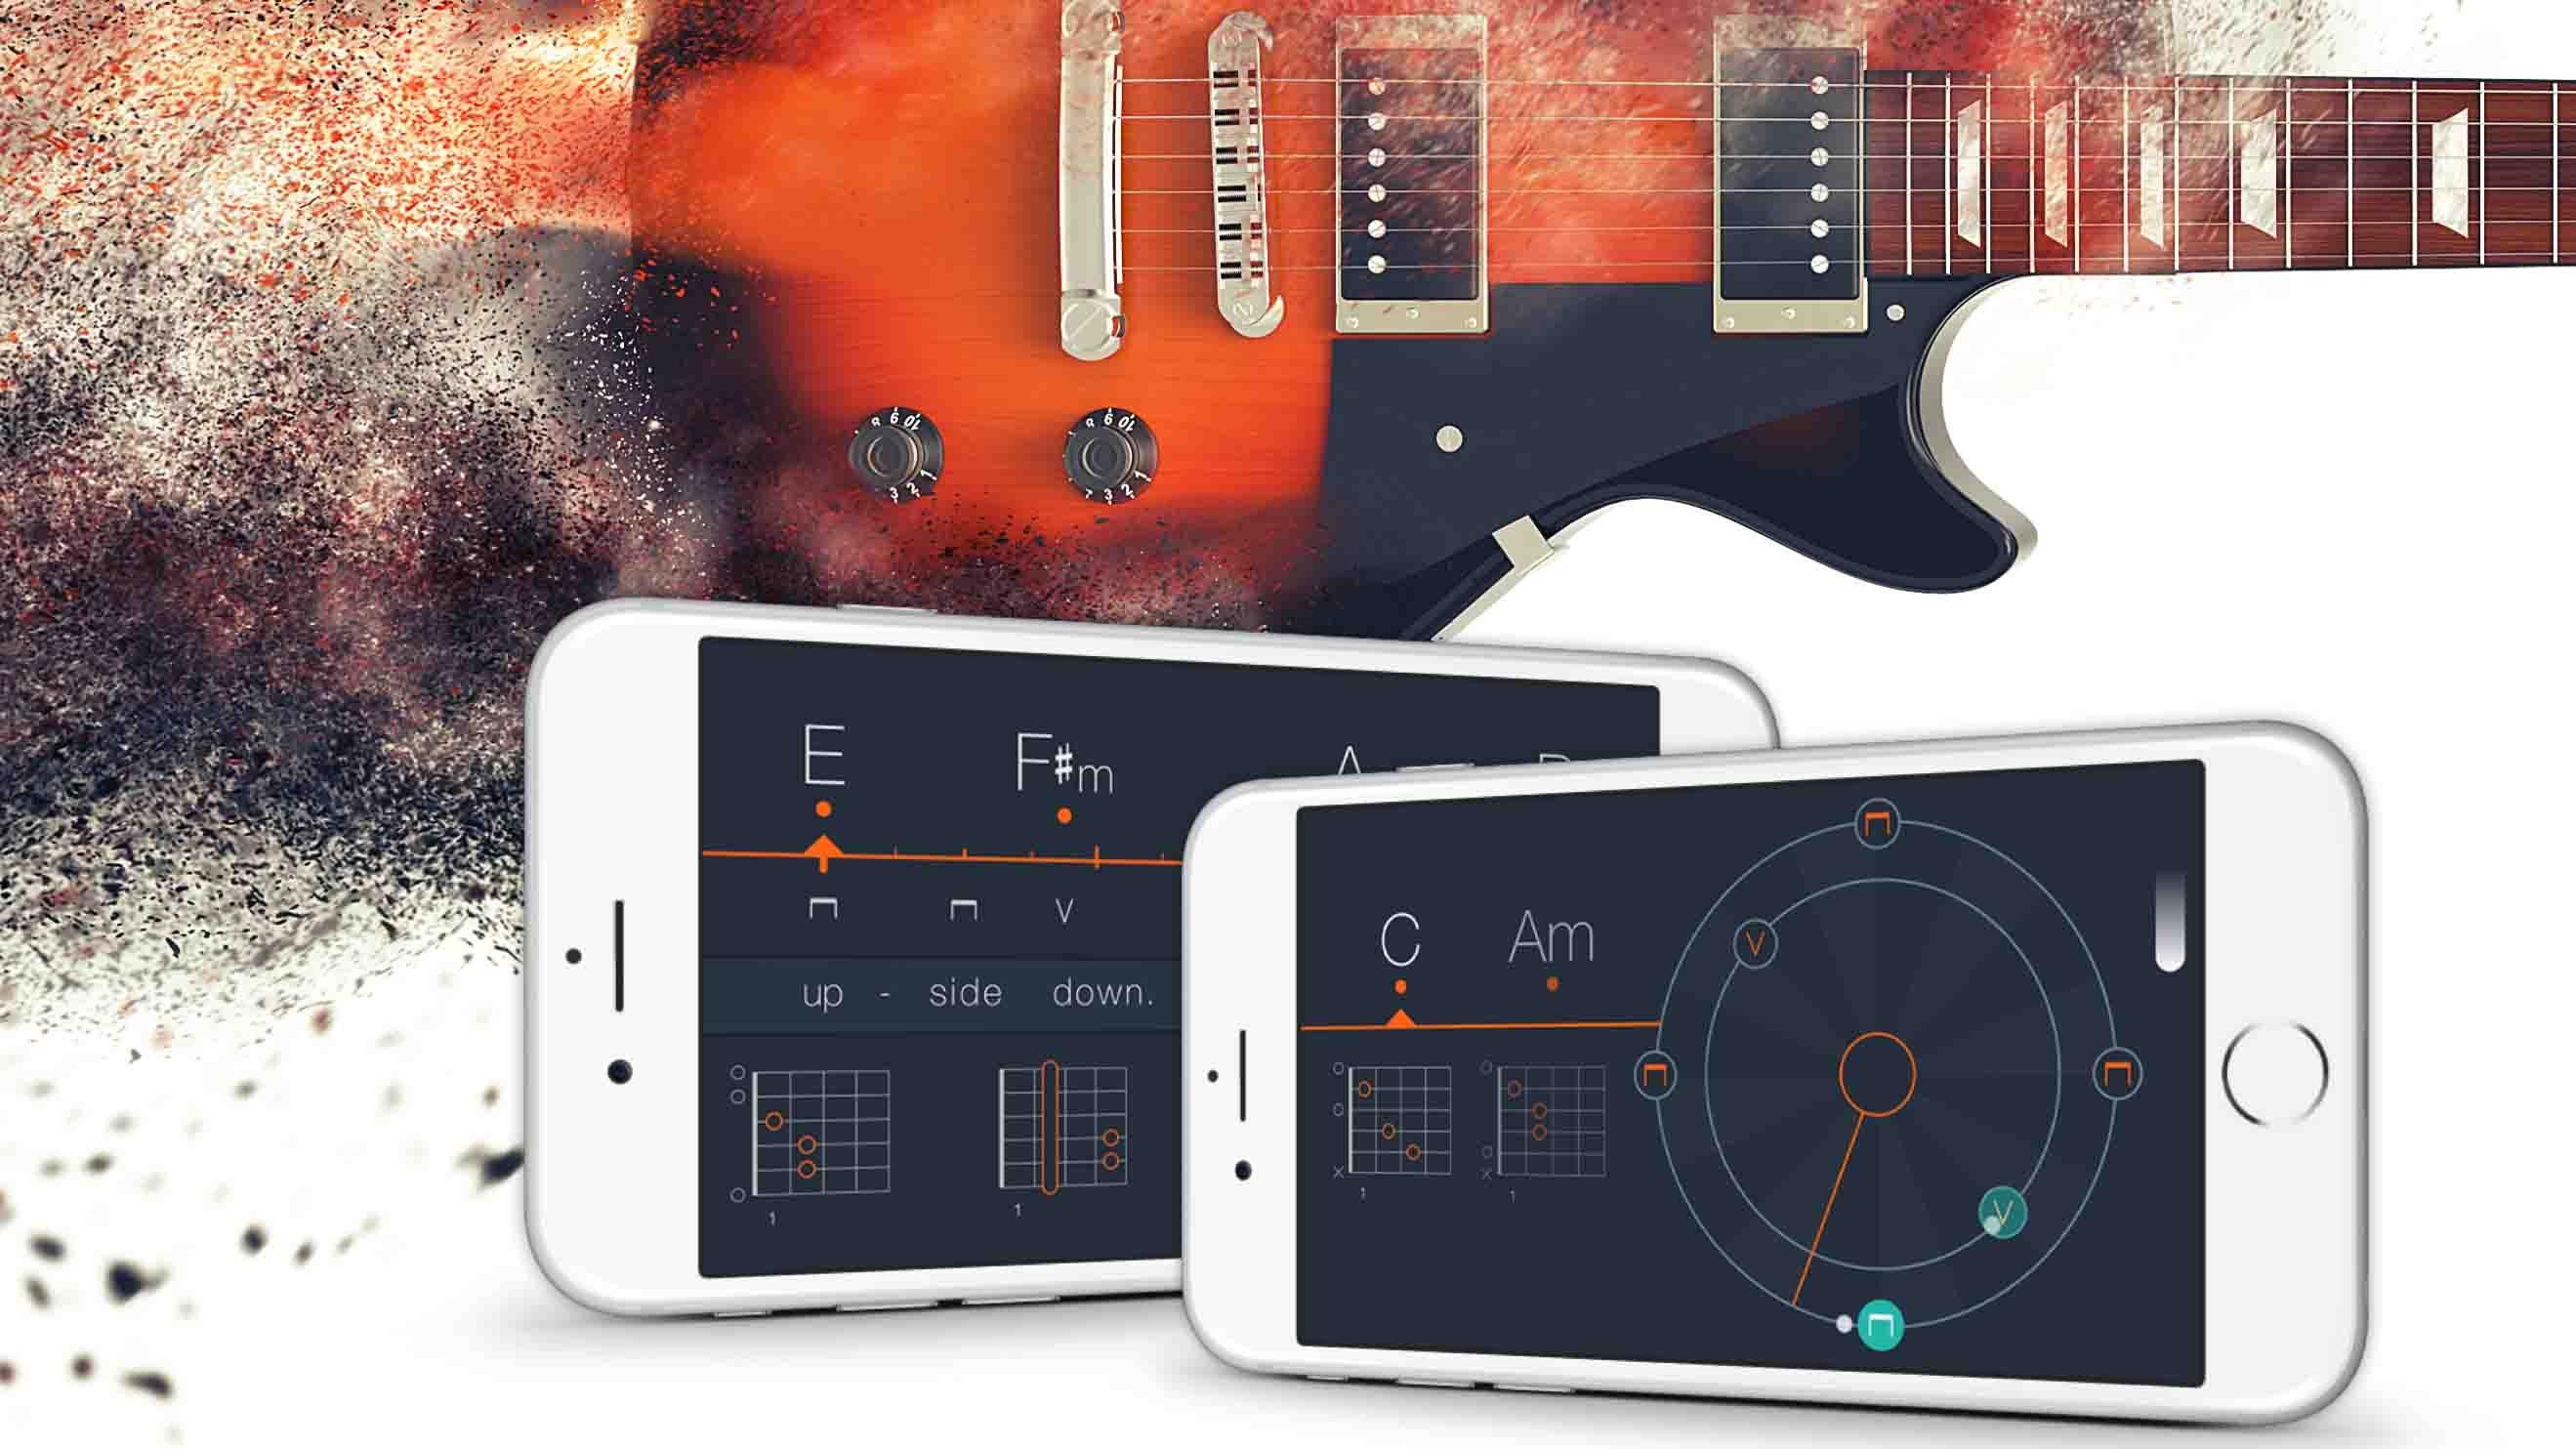 Uberchord Guitar Learning App Adds Universal Music Songs Musicradar